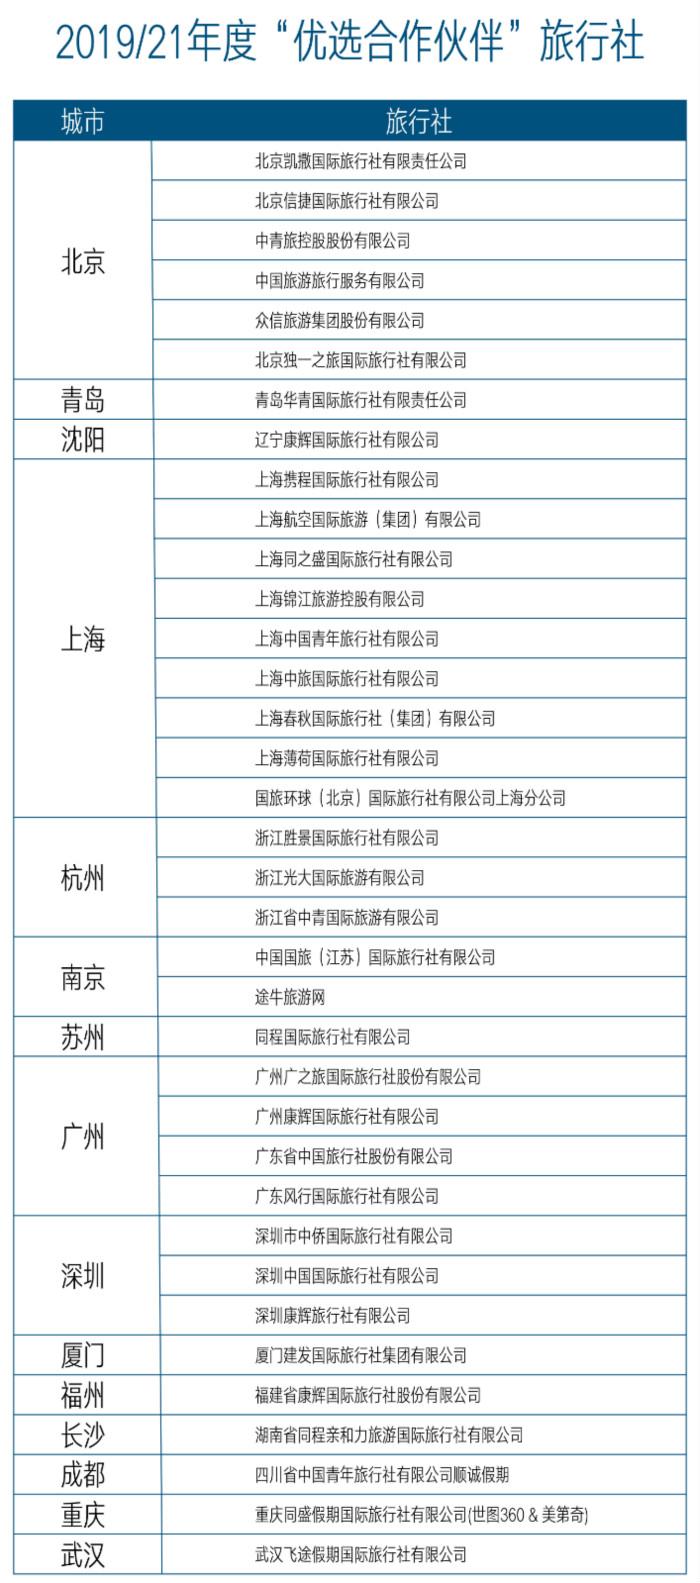 KDP3.1名单_meitu_1.jpg